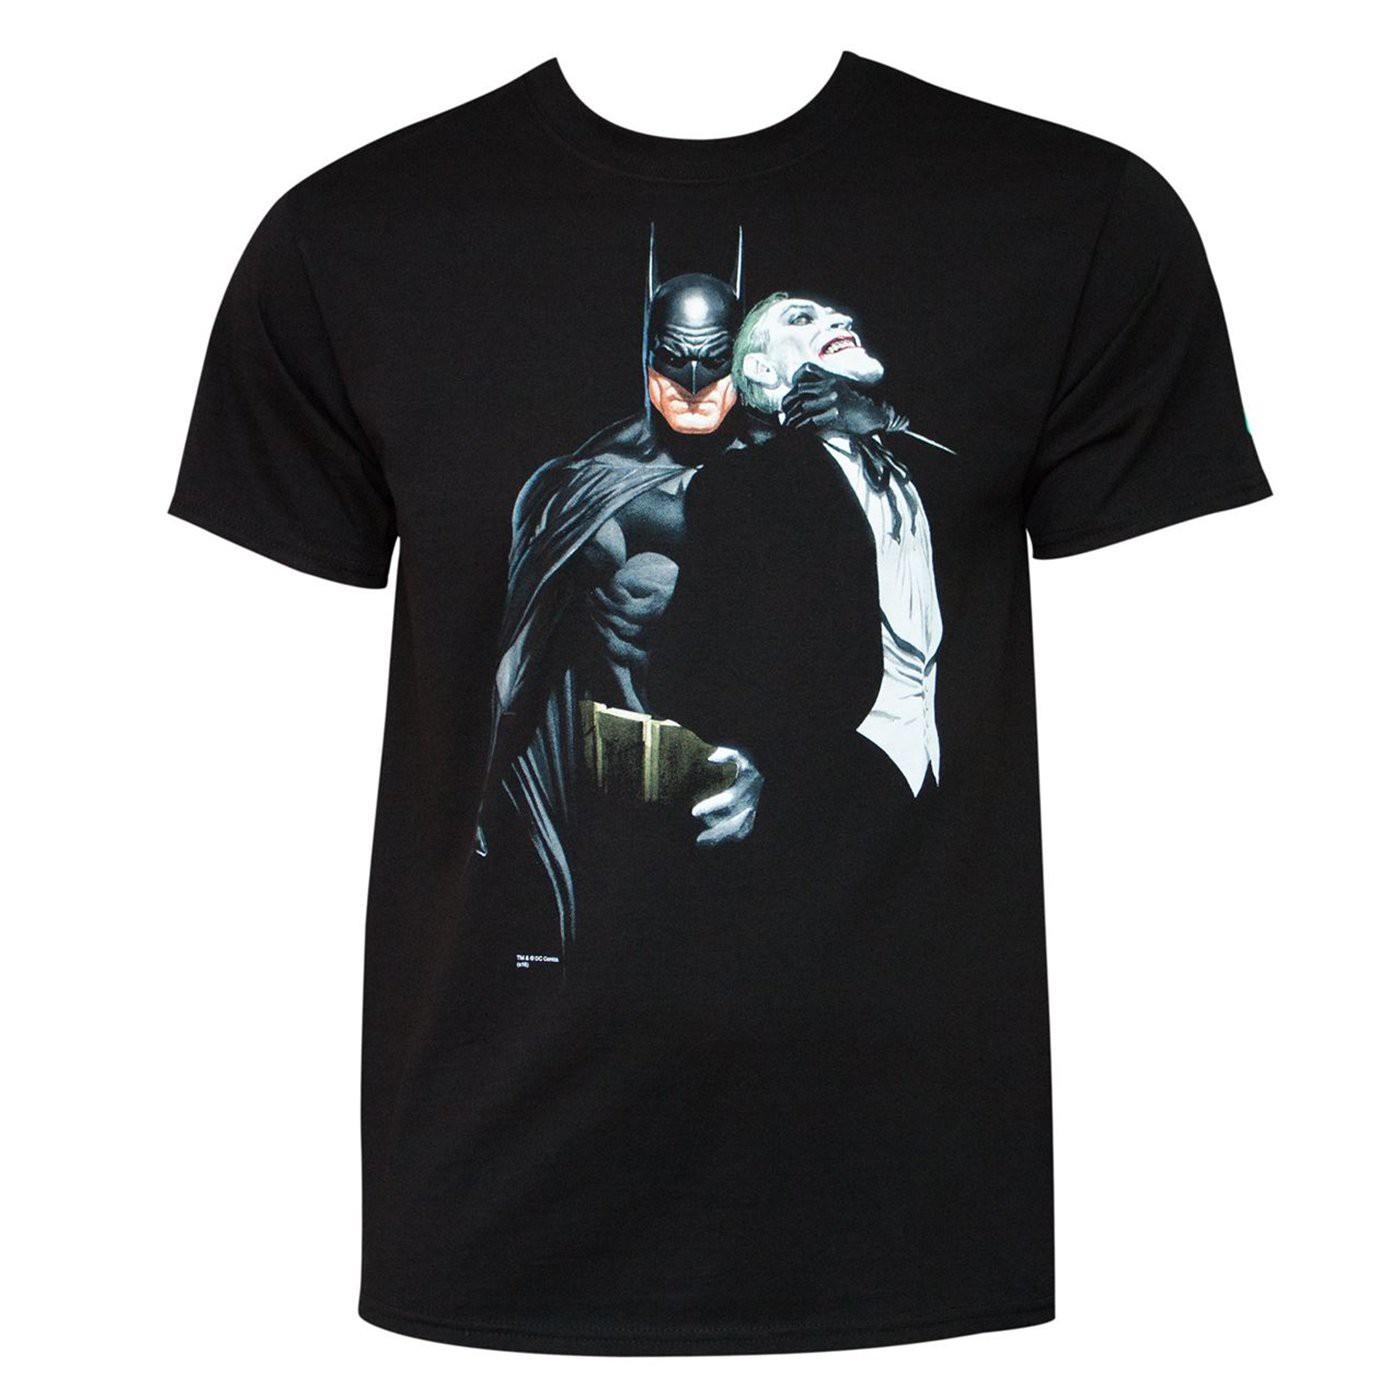 Batman: Chokeout T-Shirt by Alex Ross